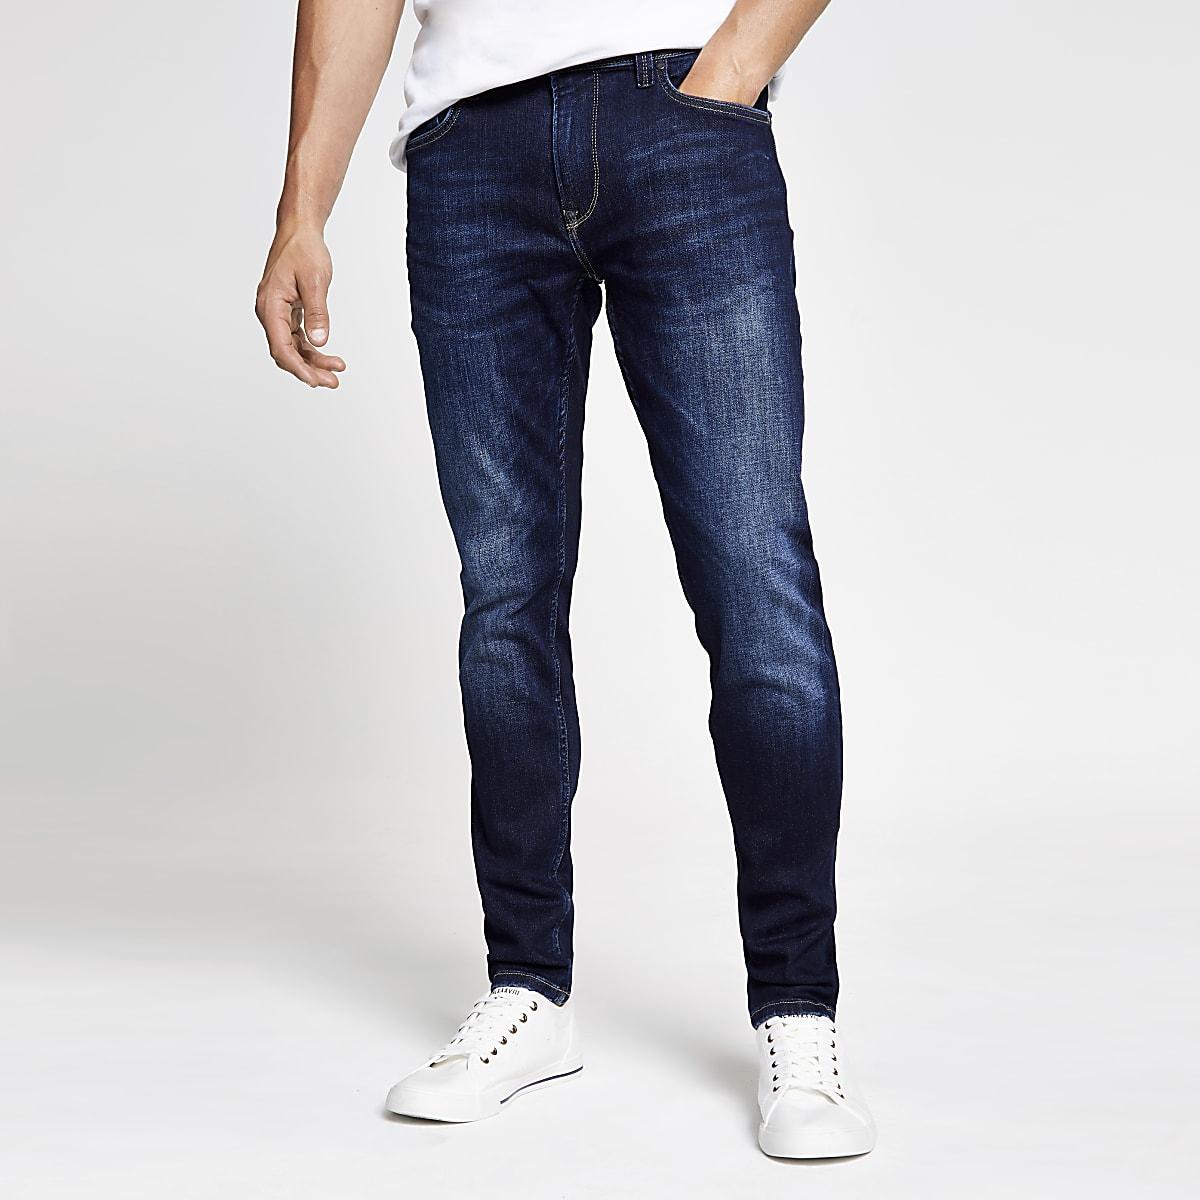 Pepe Jeans light blue skinny jeans